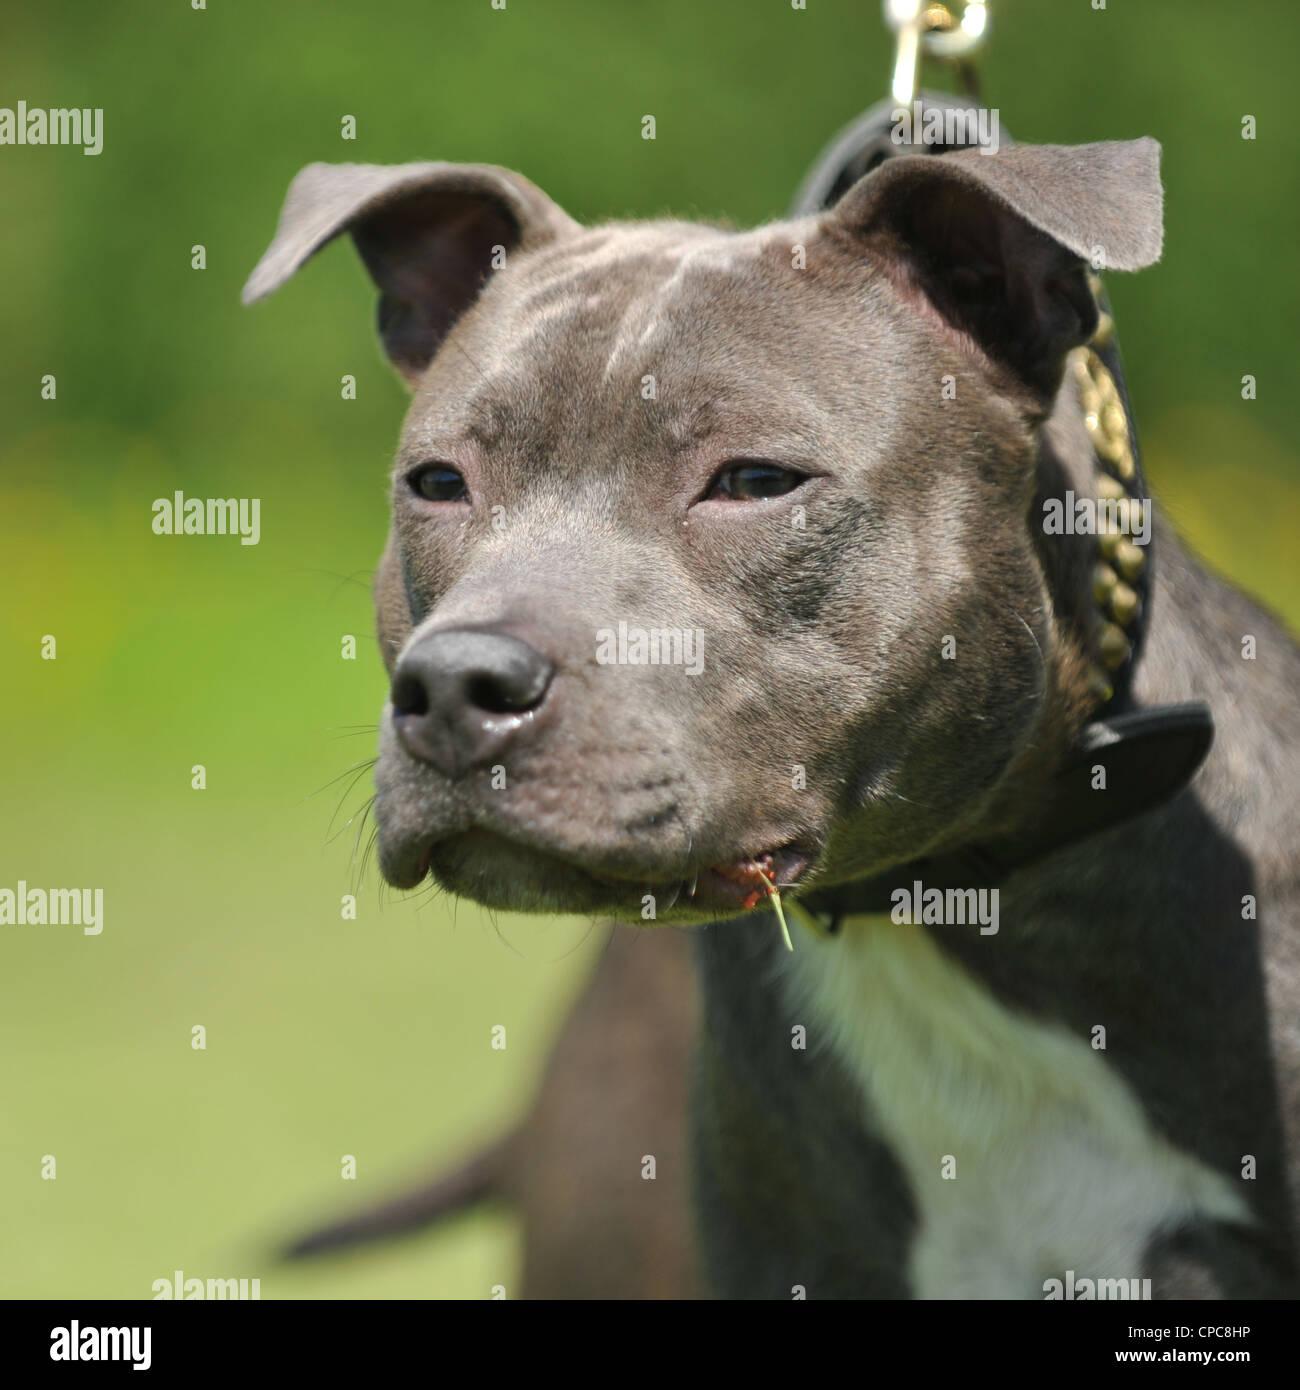 blue staffordshire bull terrier - Stock Image